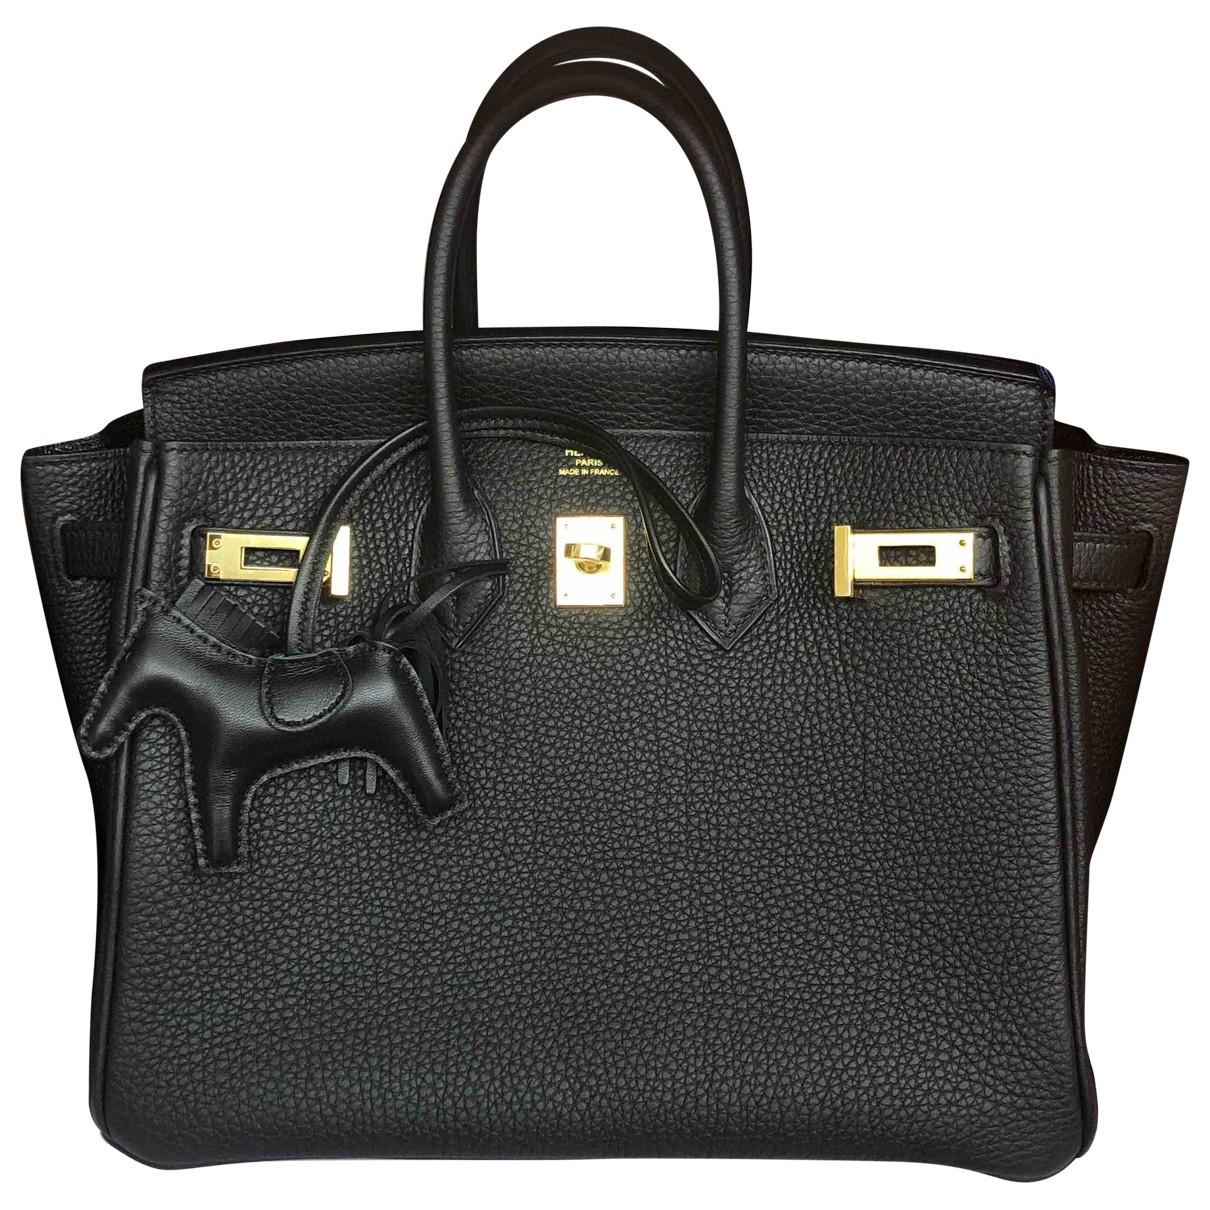 Hermes - Sac a main Birkin 25 pour femme en cuir - noir